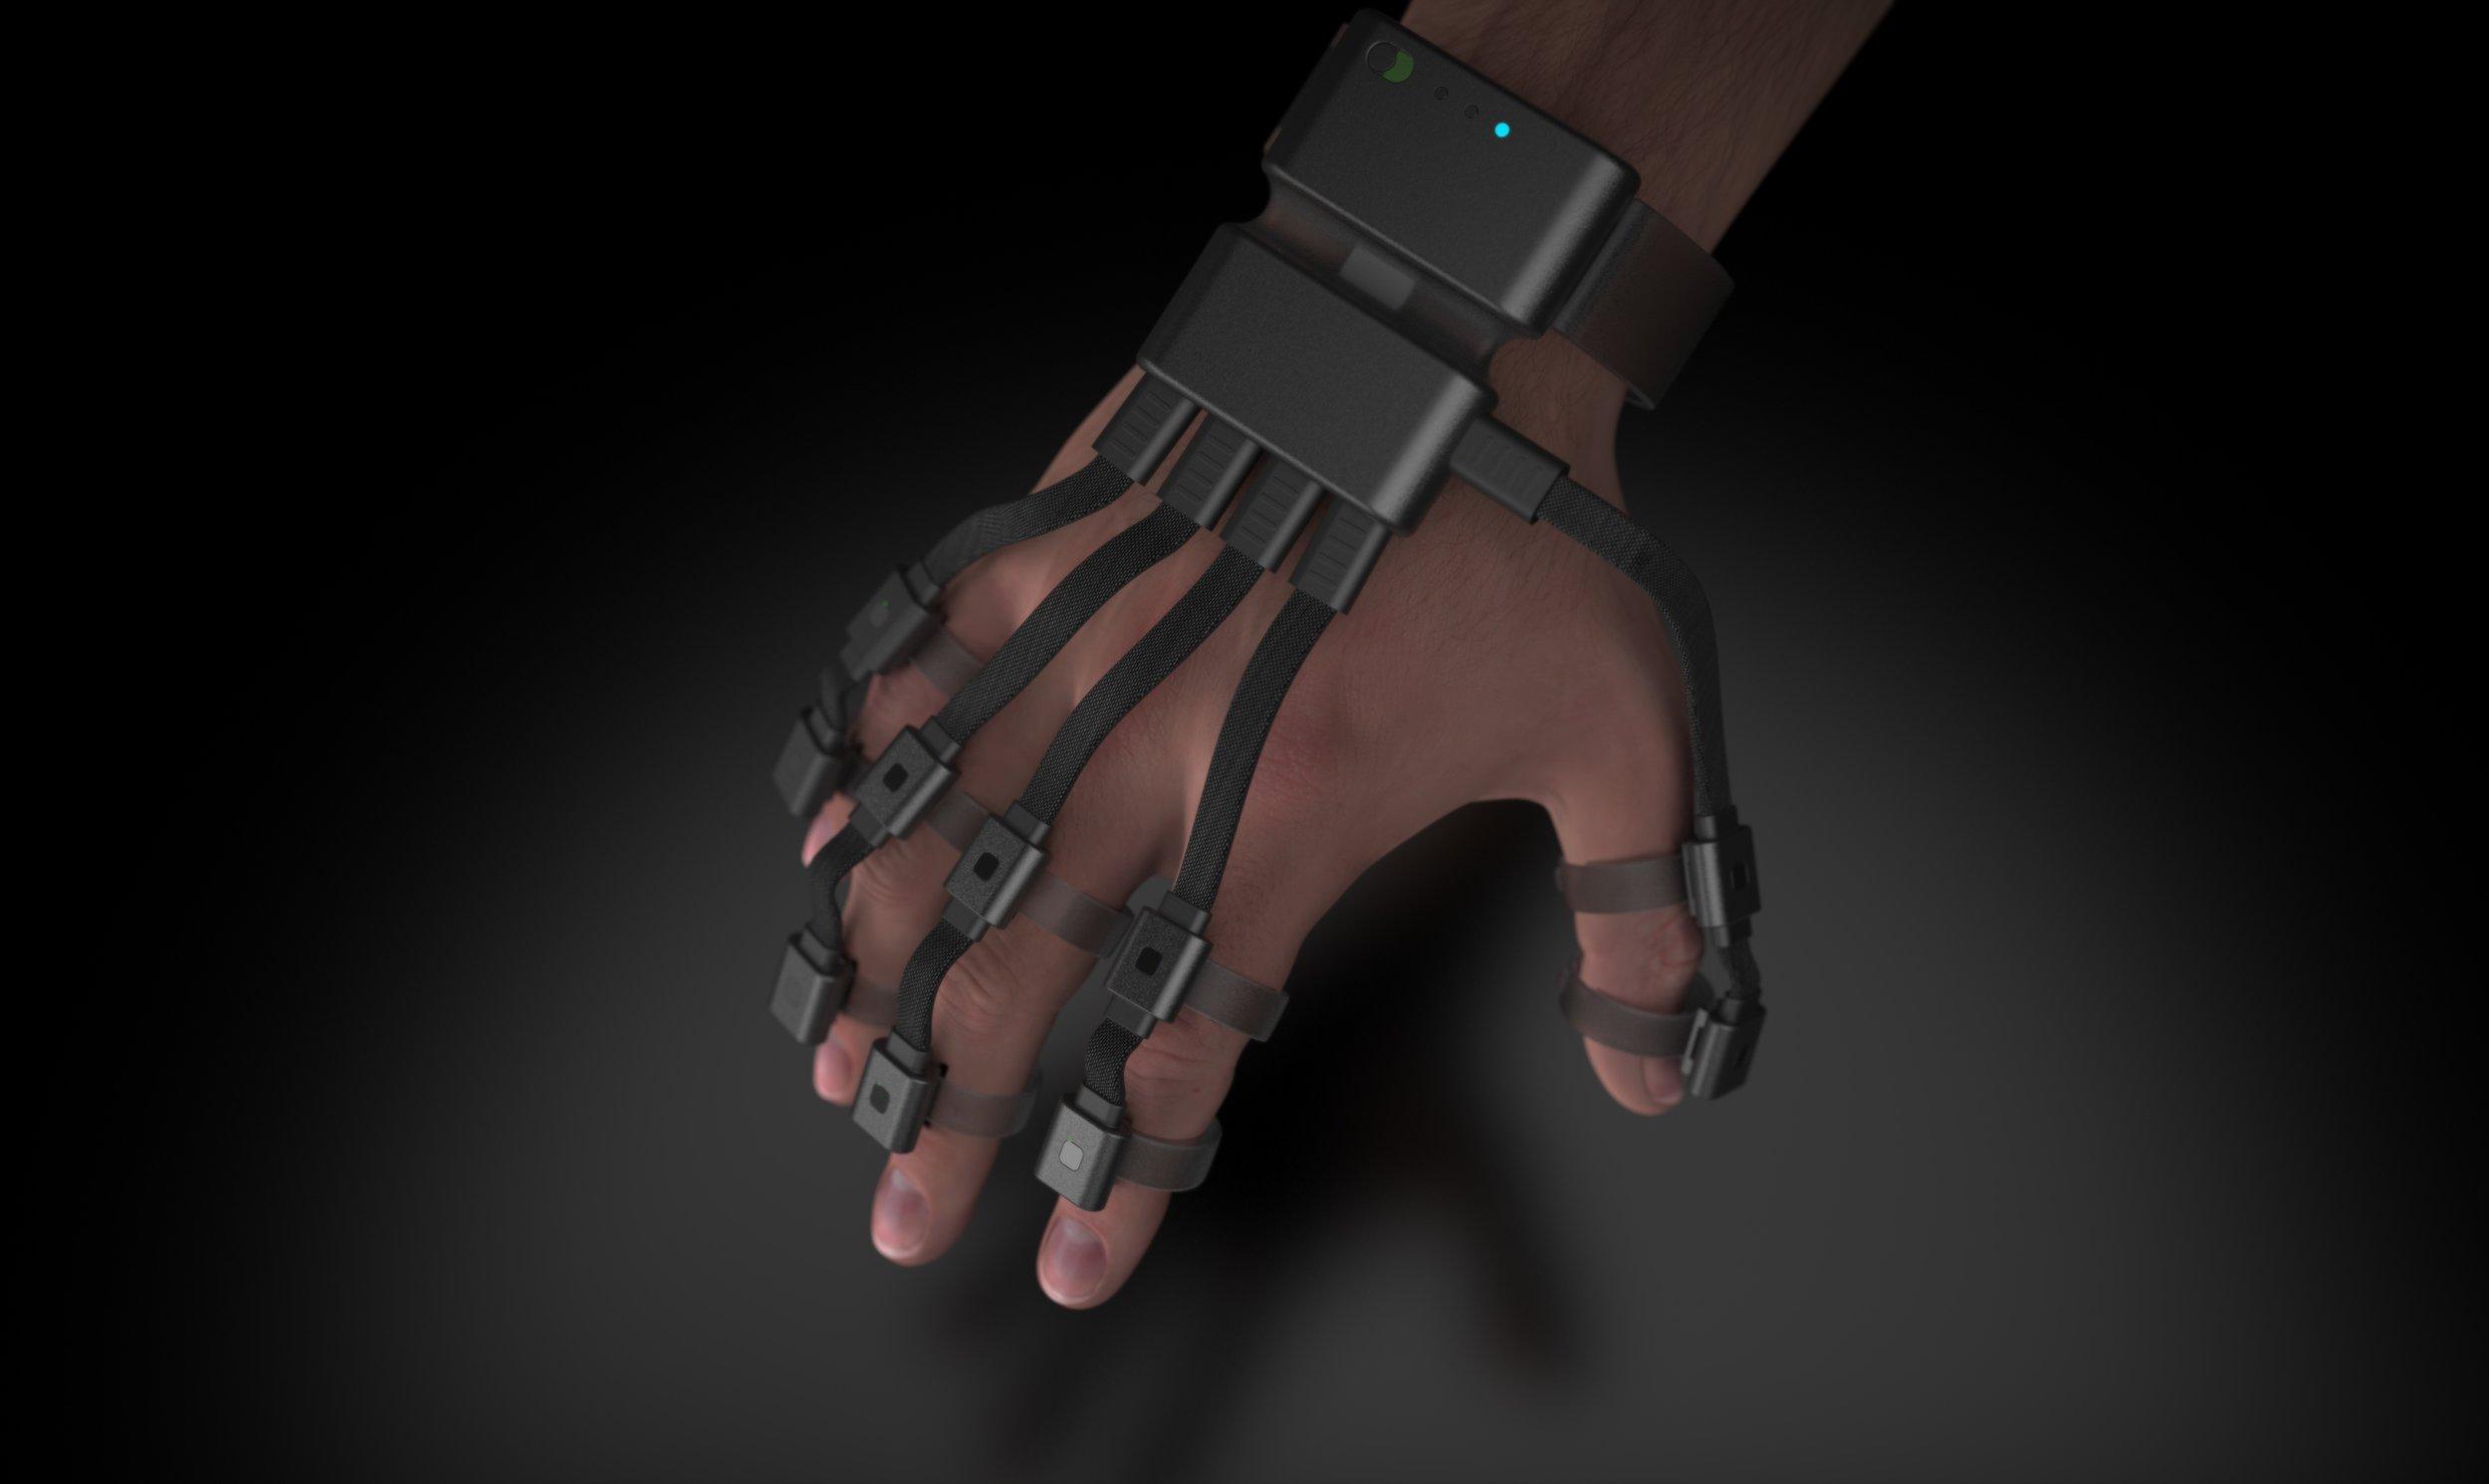 Hand master_03.1274.jpg